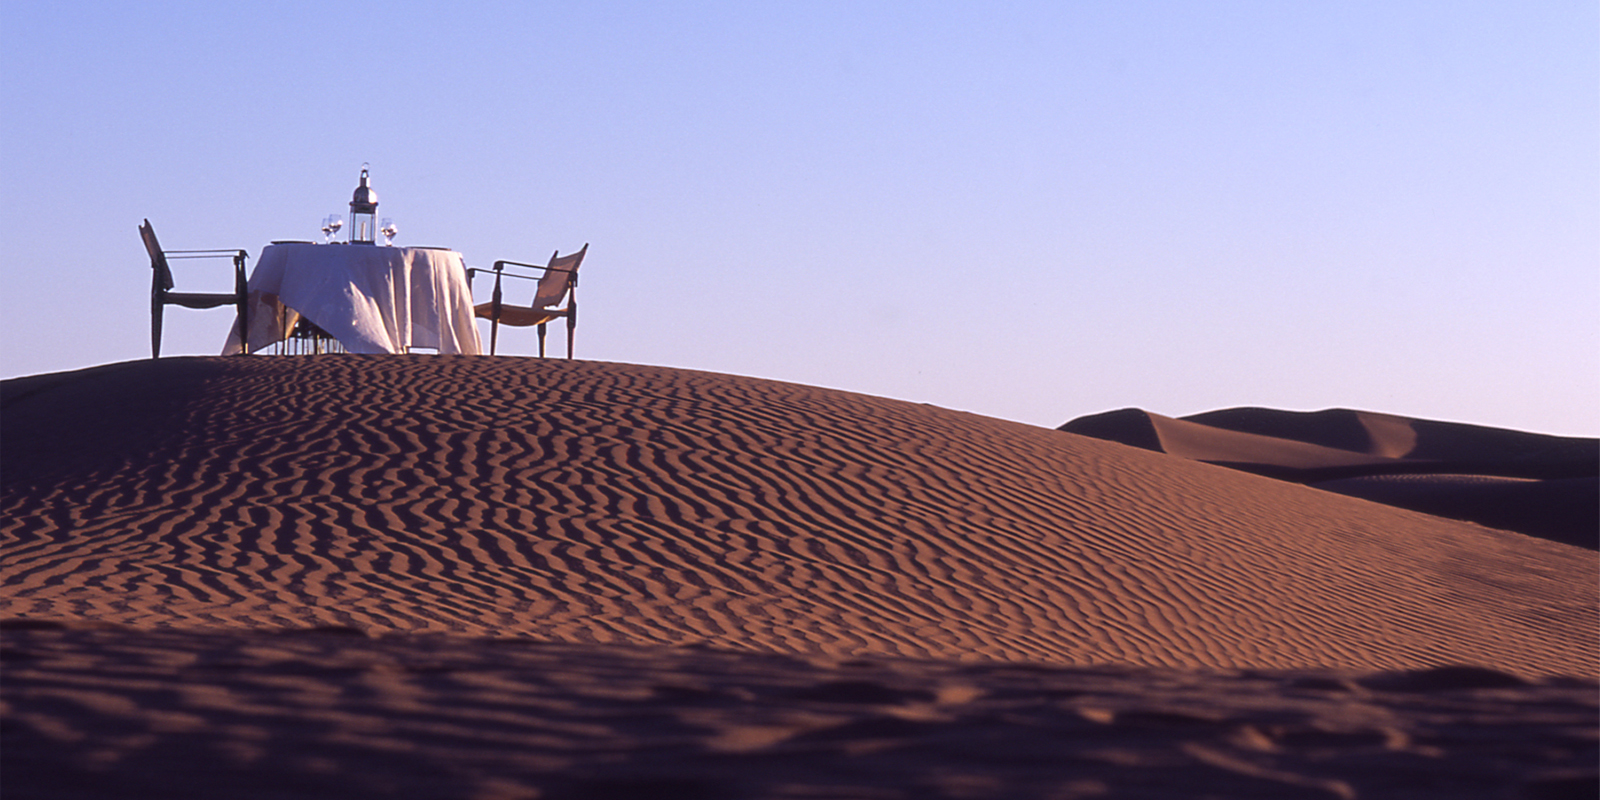 Dar Ahlam Nomad Dunes Camp, Morocco